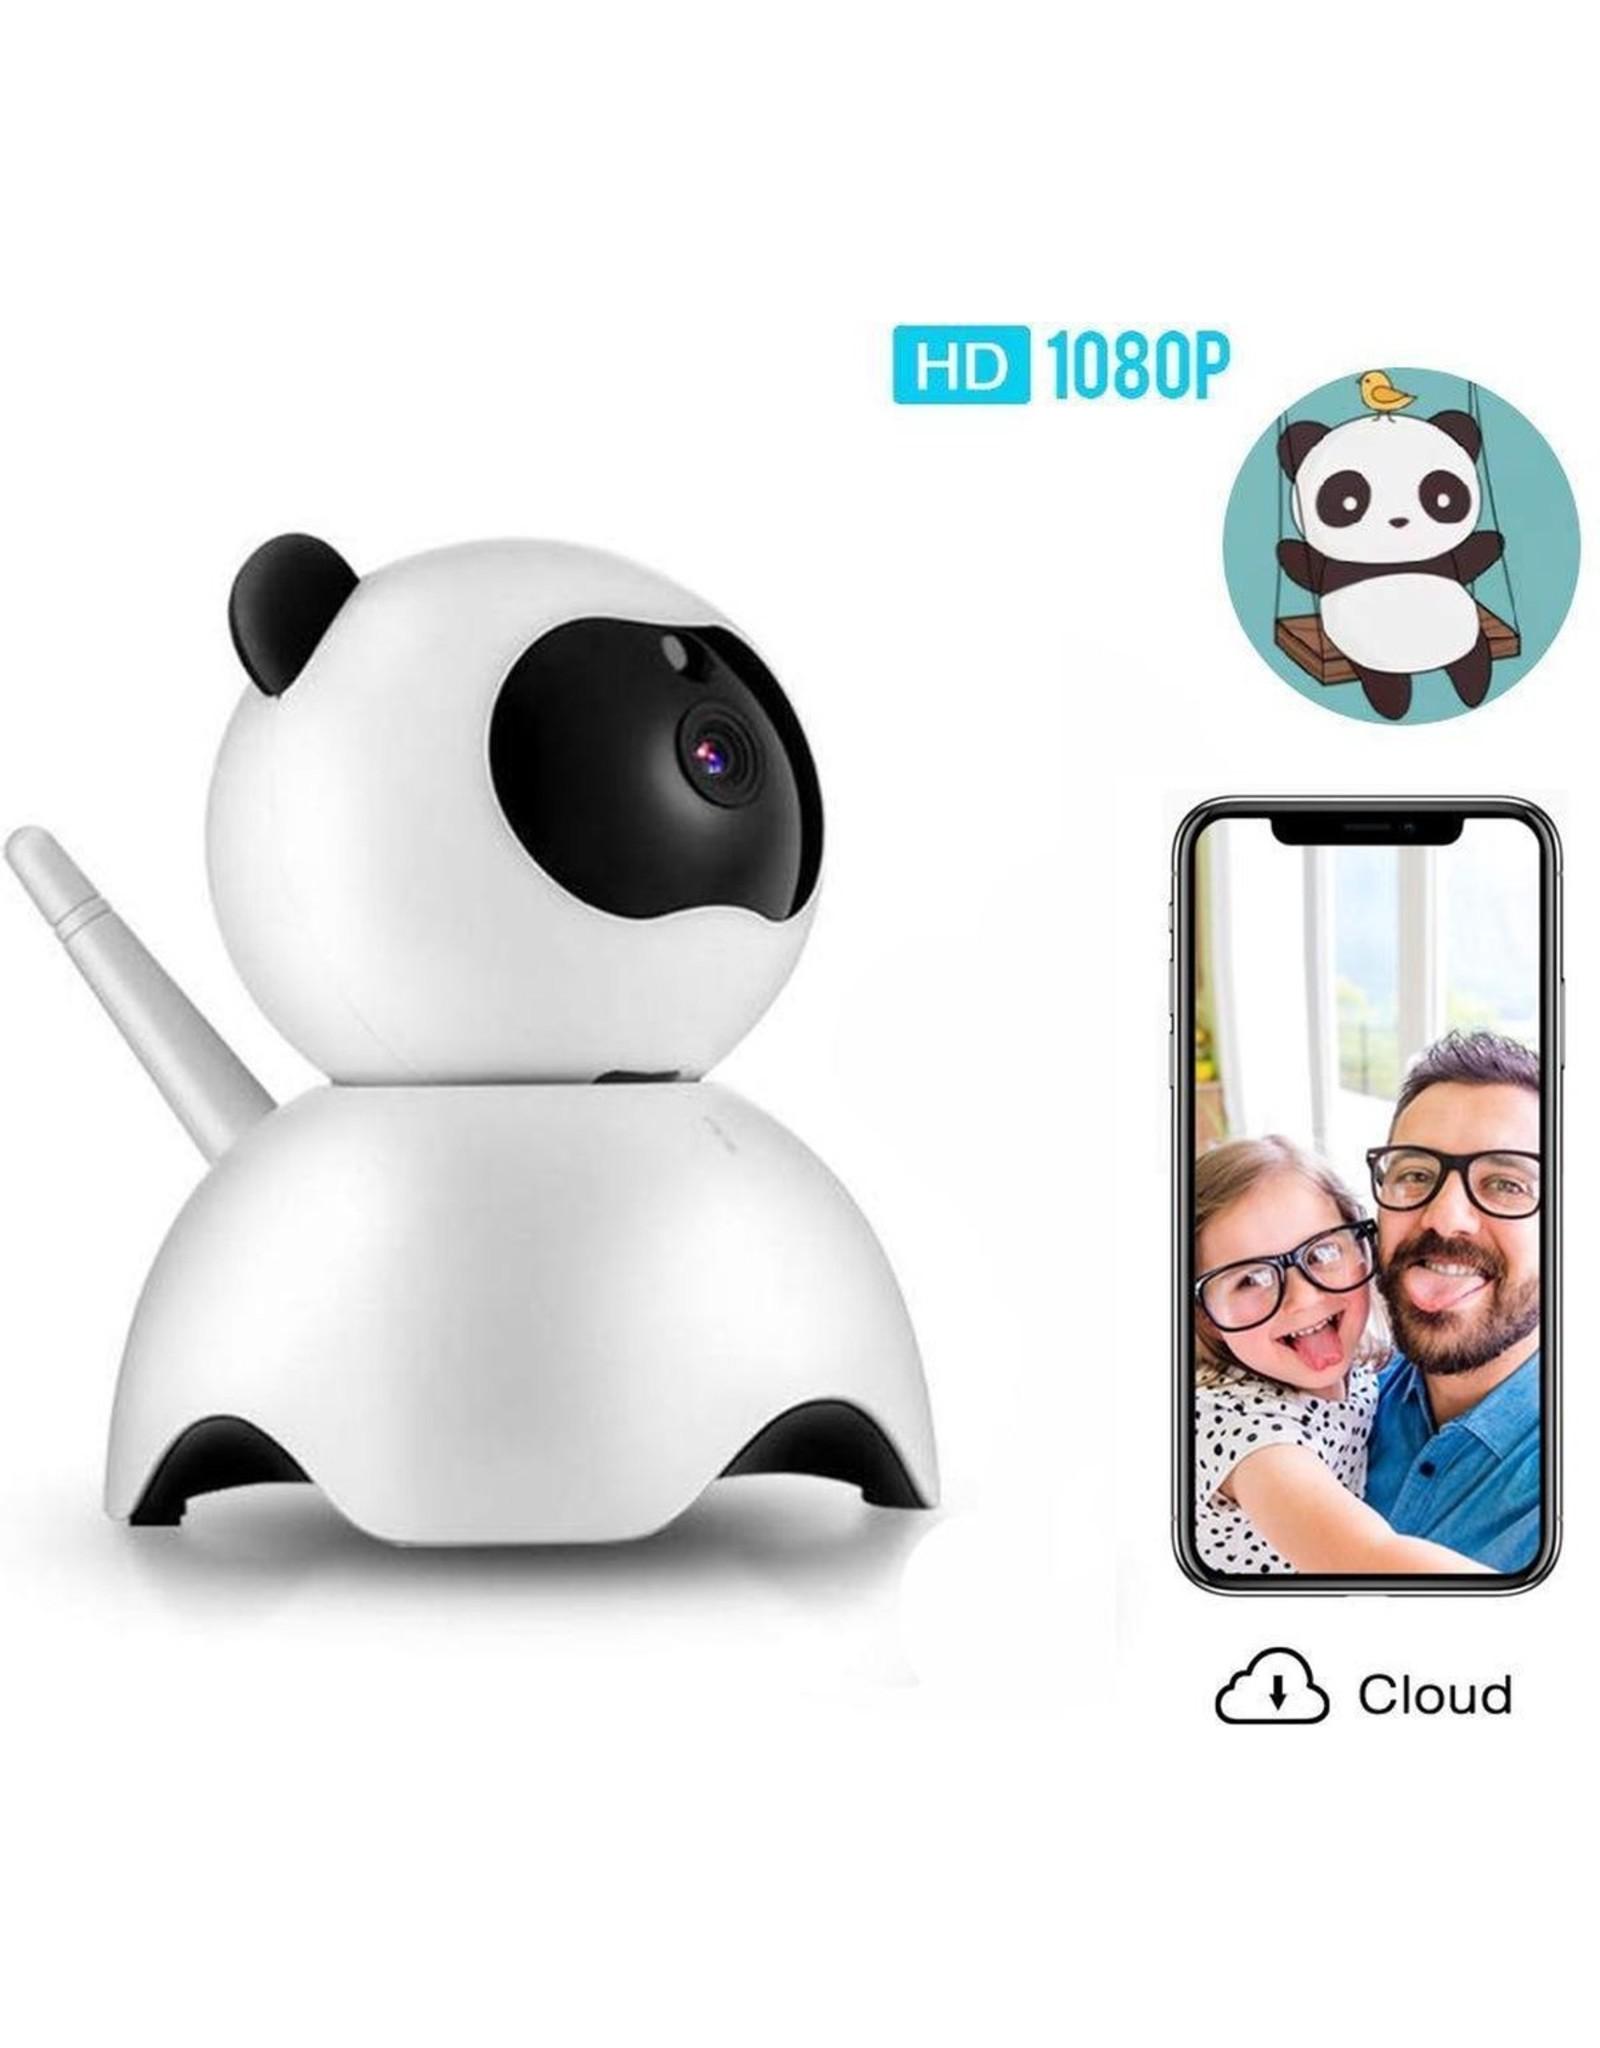 Panda Babyfoon 1080P FHD WiFi IP Beveiligingscamera -Video Babyfoon